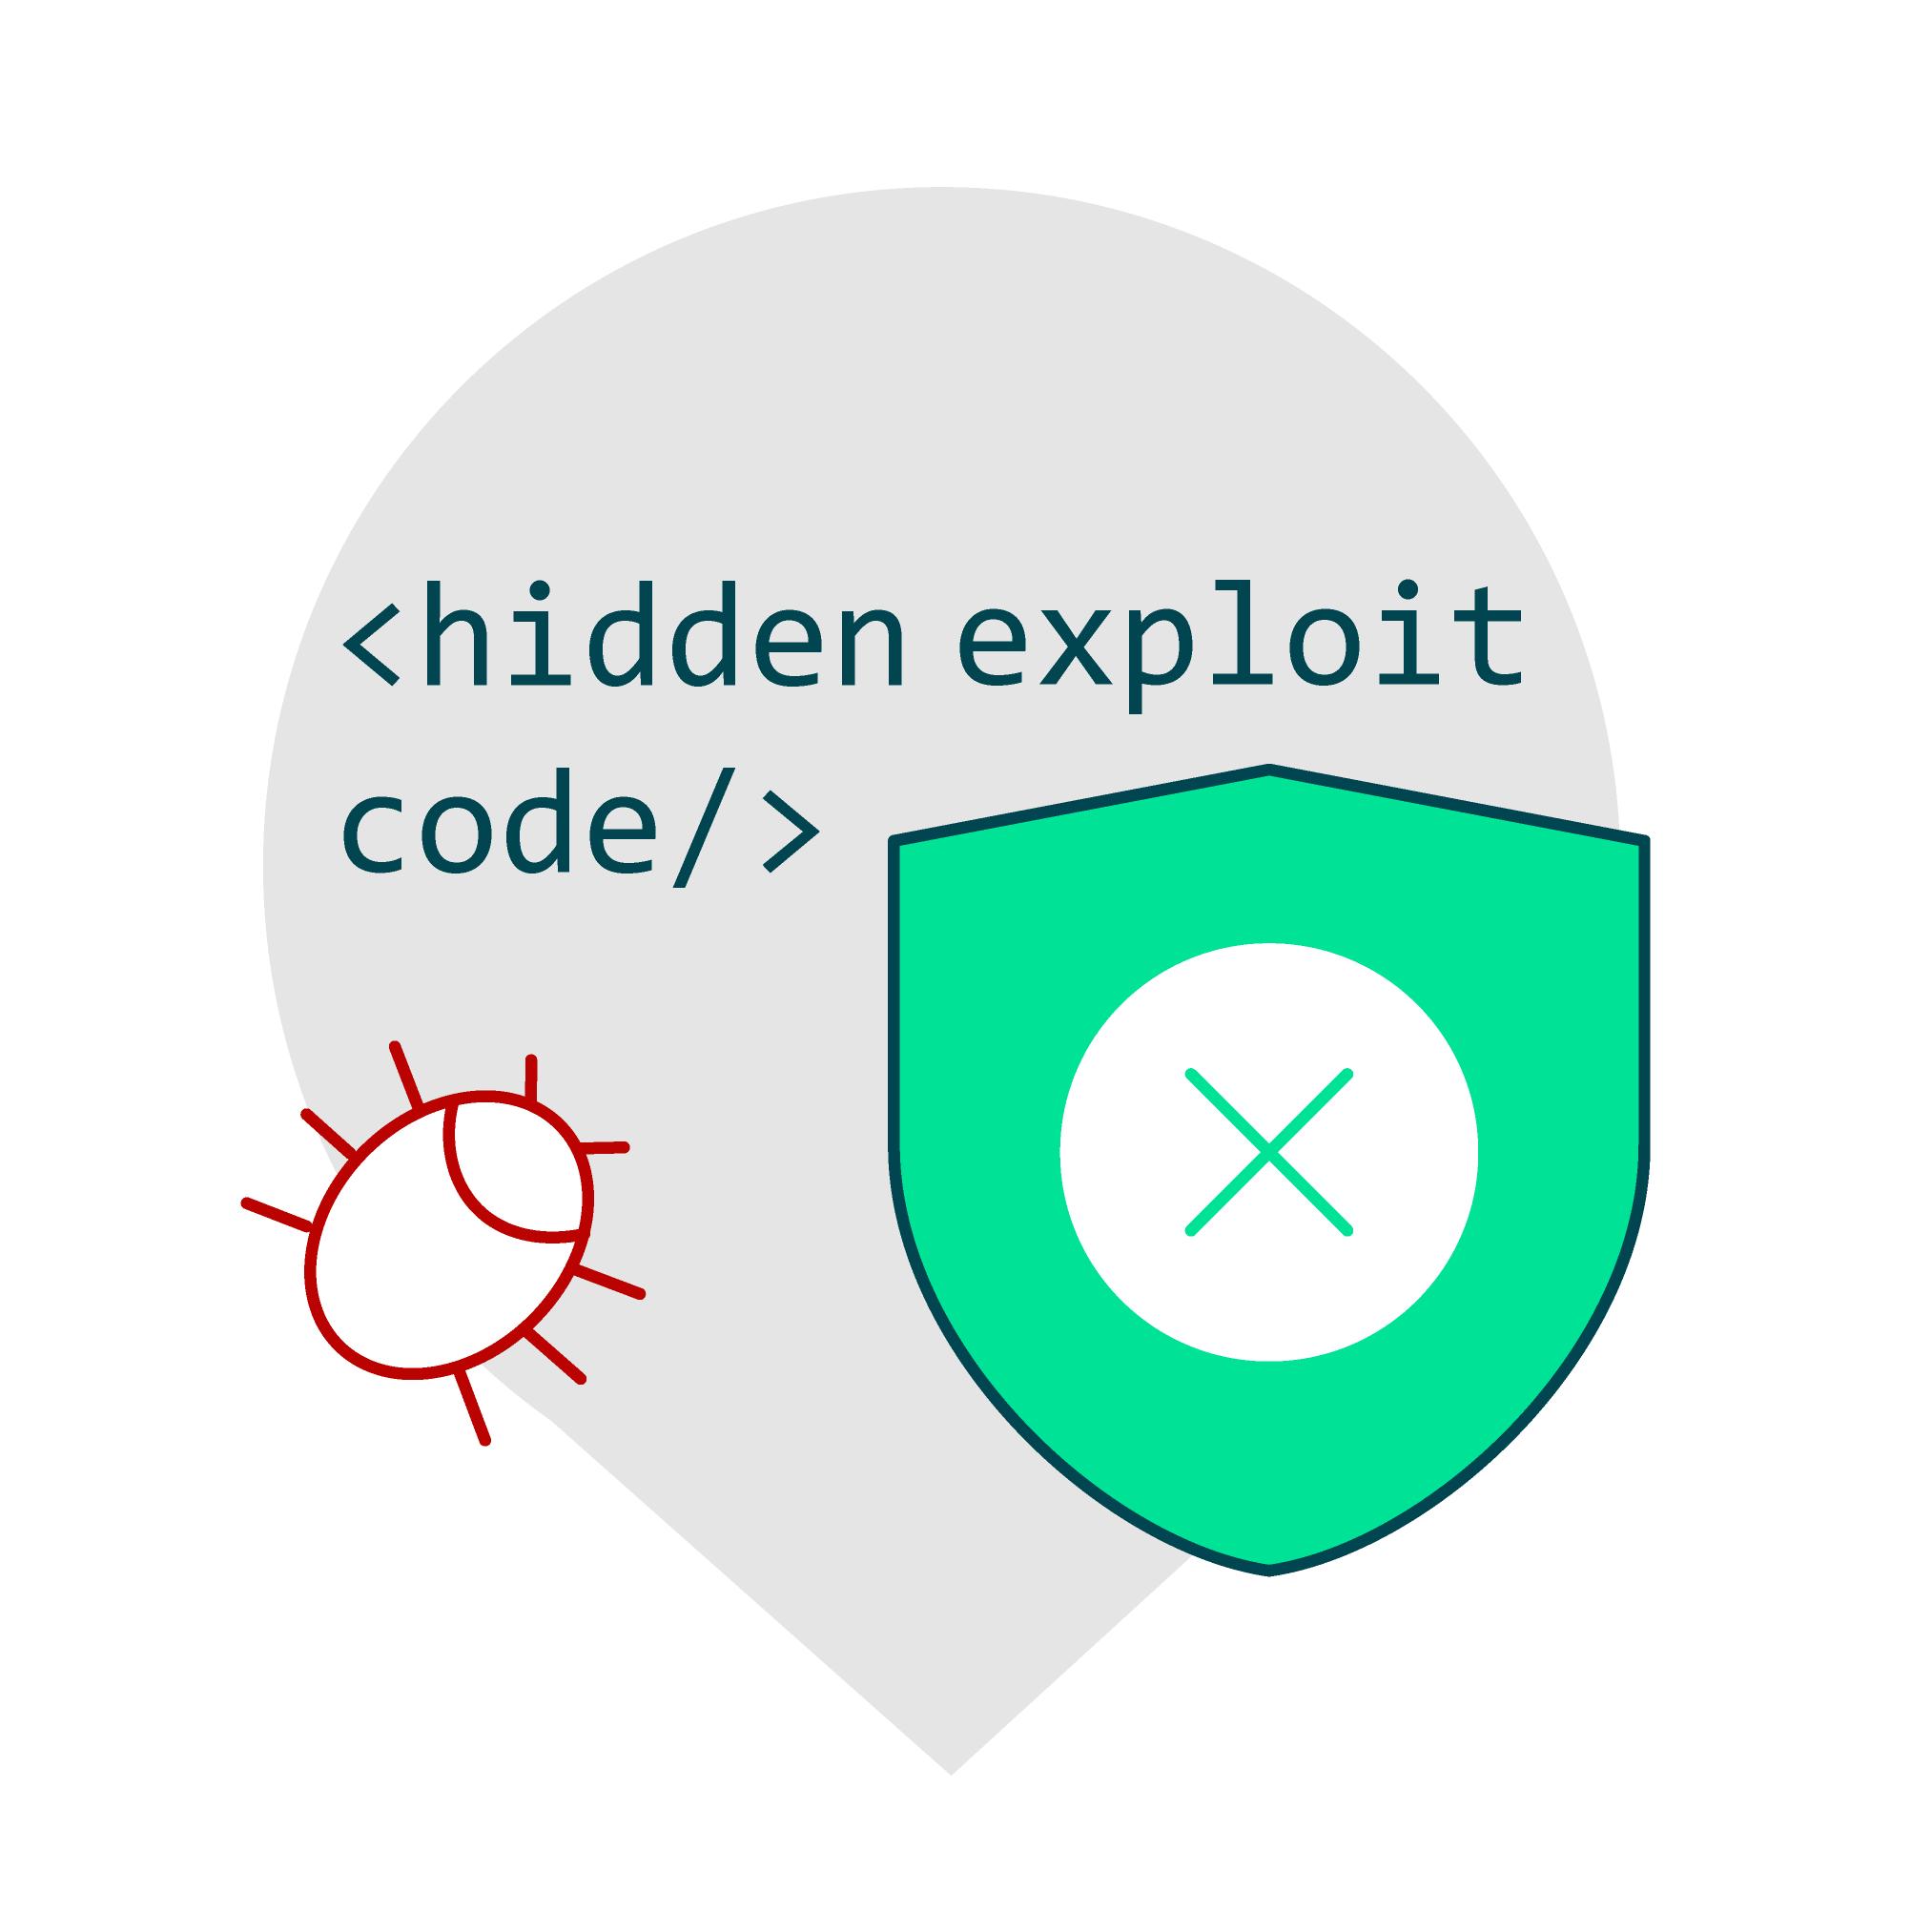 Hidden exploit codes on the website